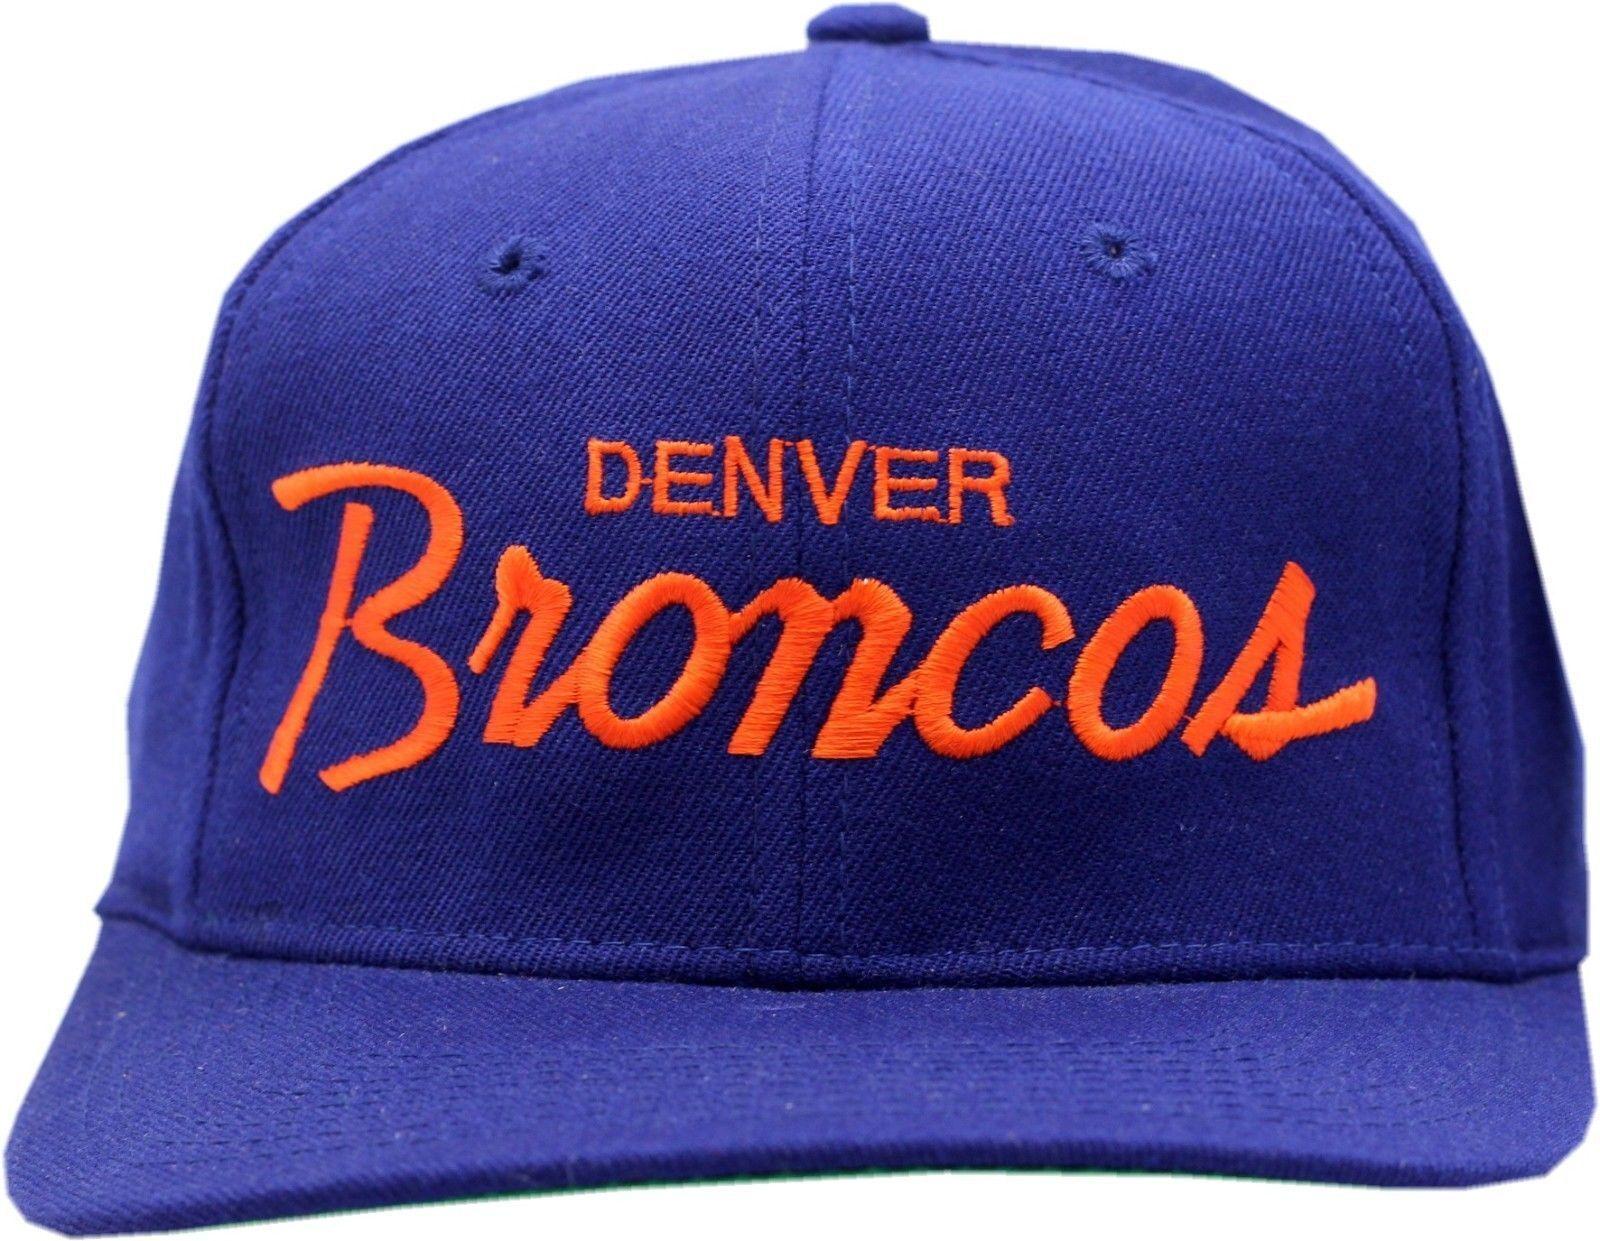 official photos 2dfb3 8948b Vintage Denver Broncos Script Wool Snapback-DB1446